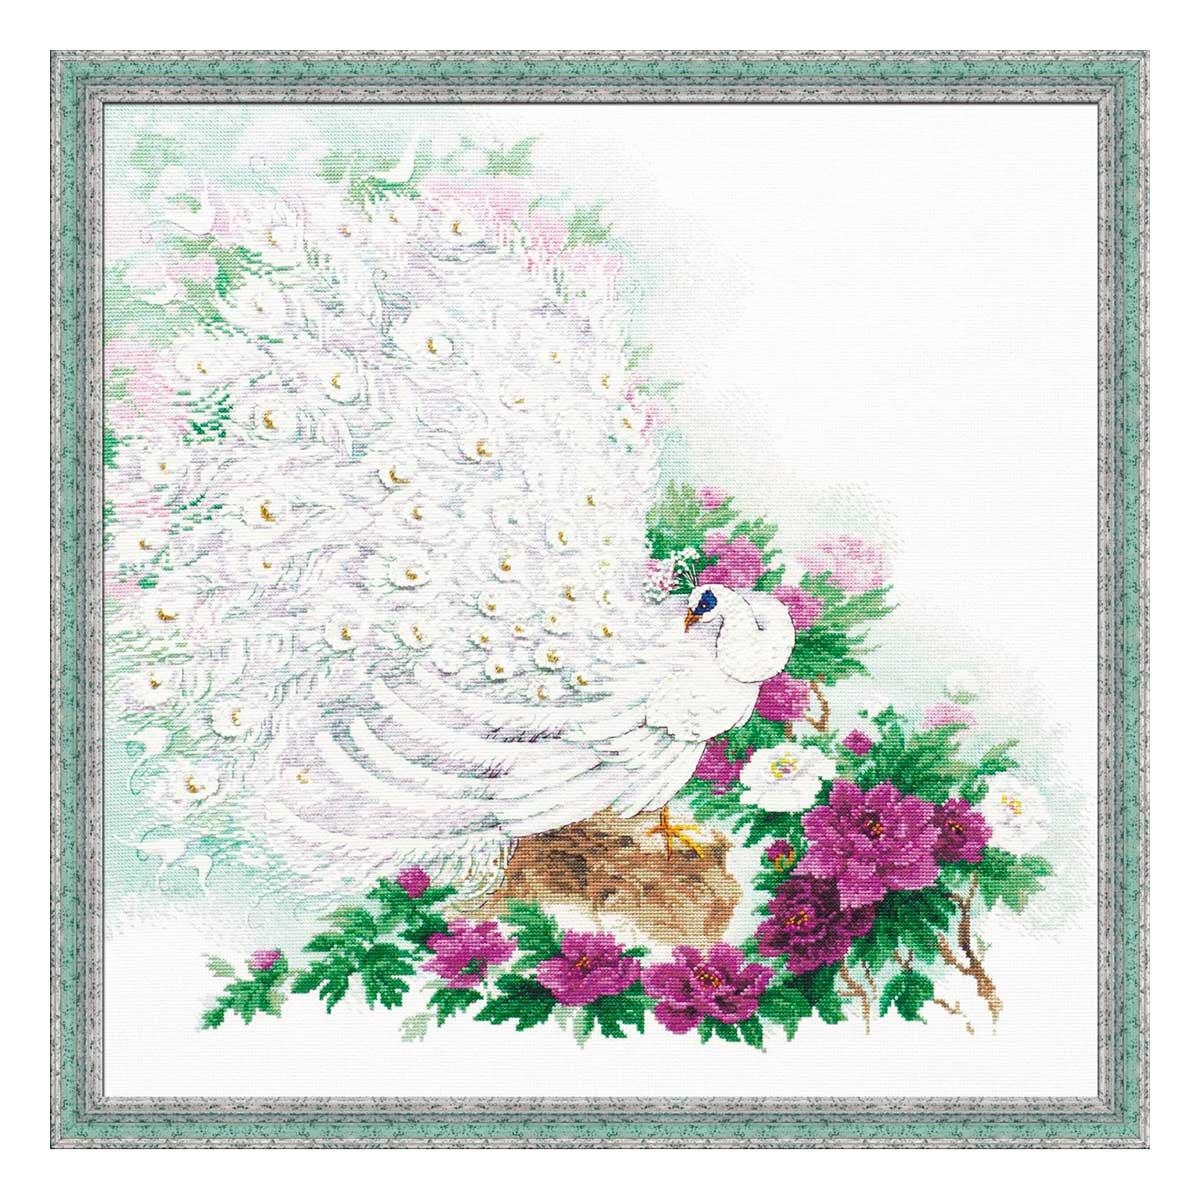 100/030 Набор для вышивания Riolis 'Сад Махараджи', 50*50 см